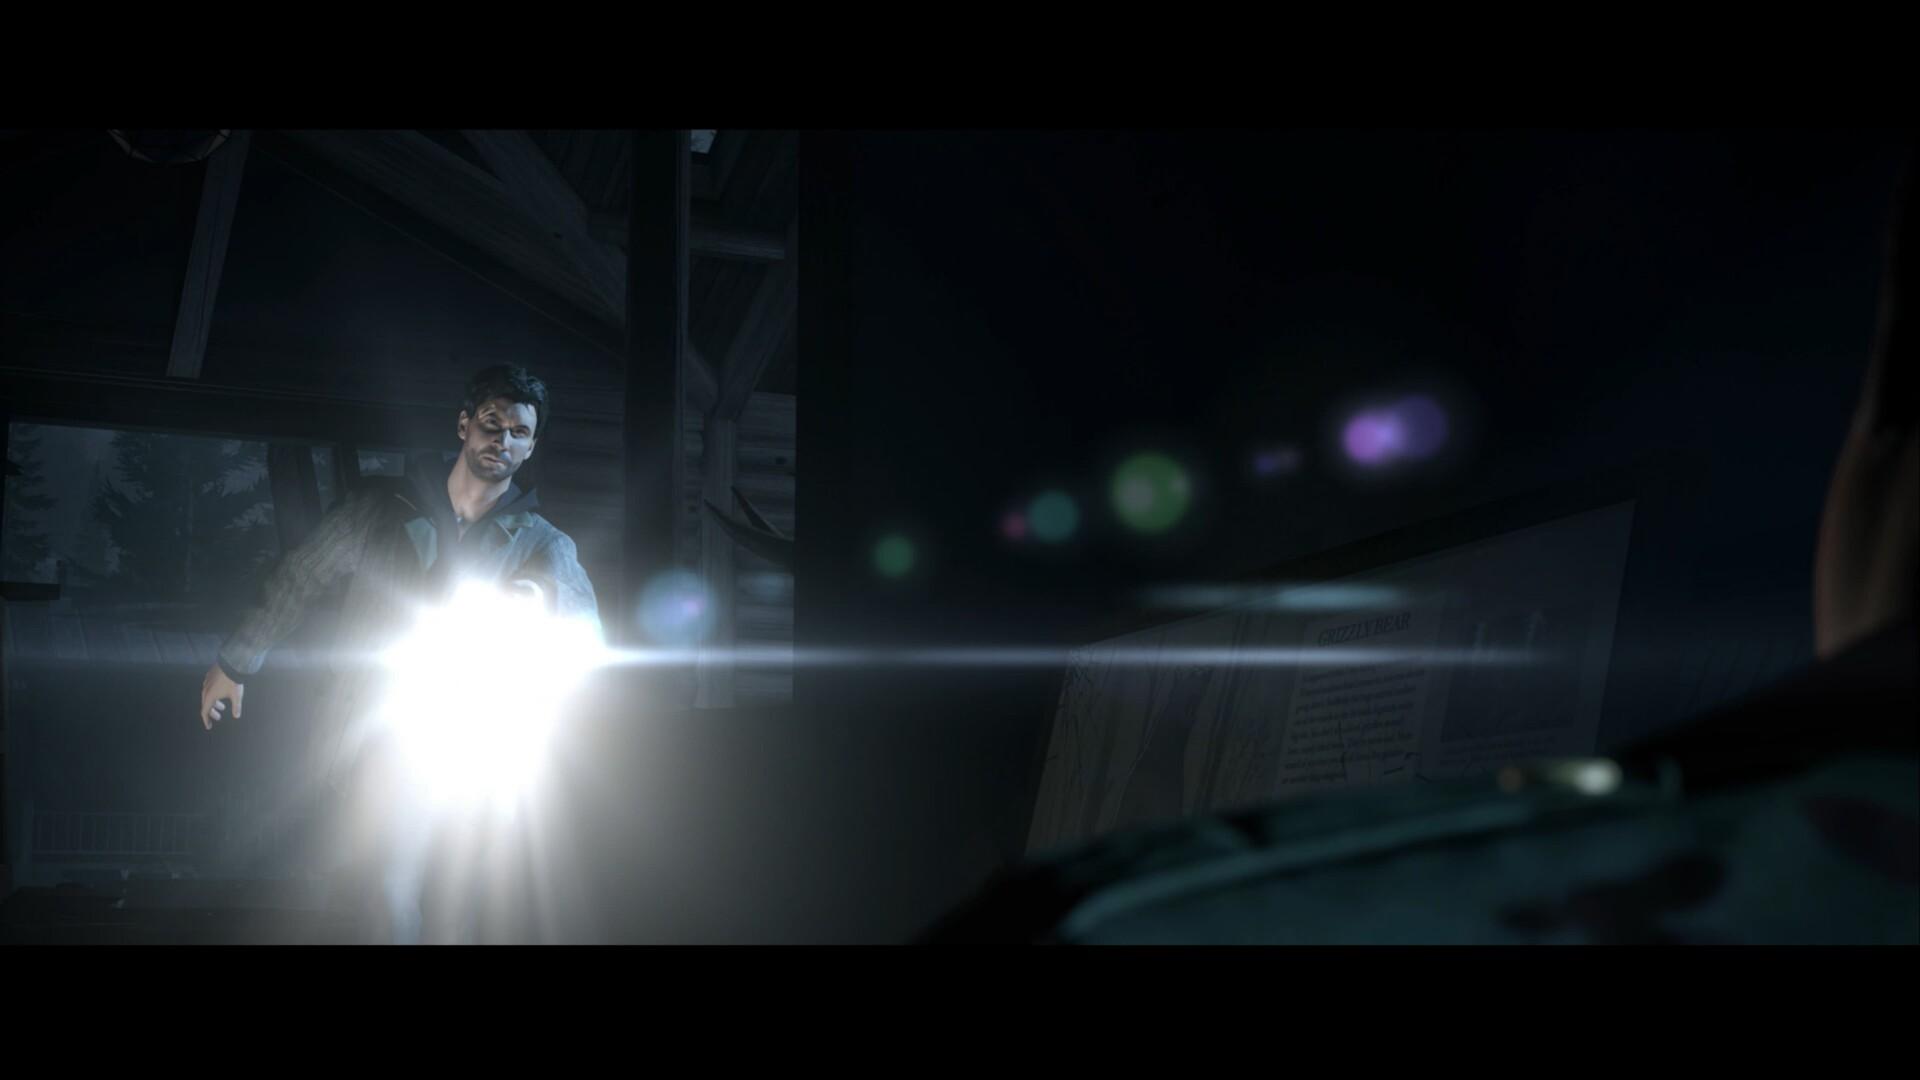 alan-wake-remastered-tech-review-—-the-dark-half